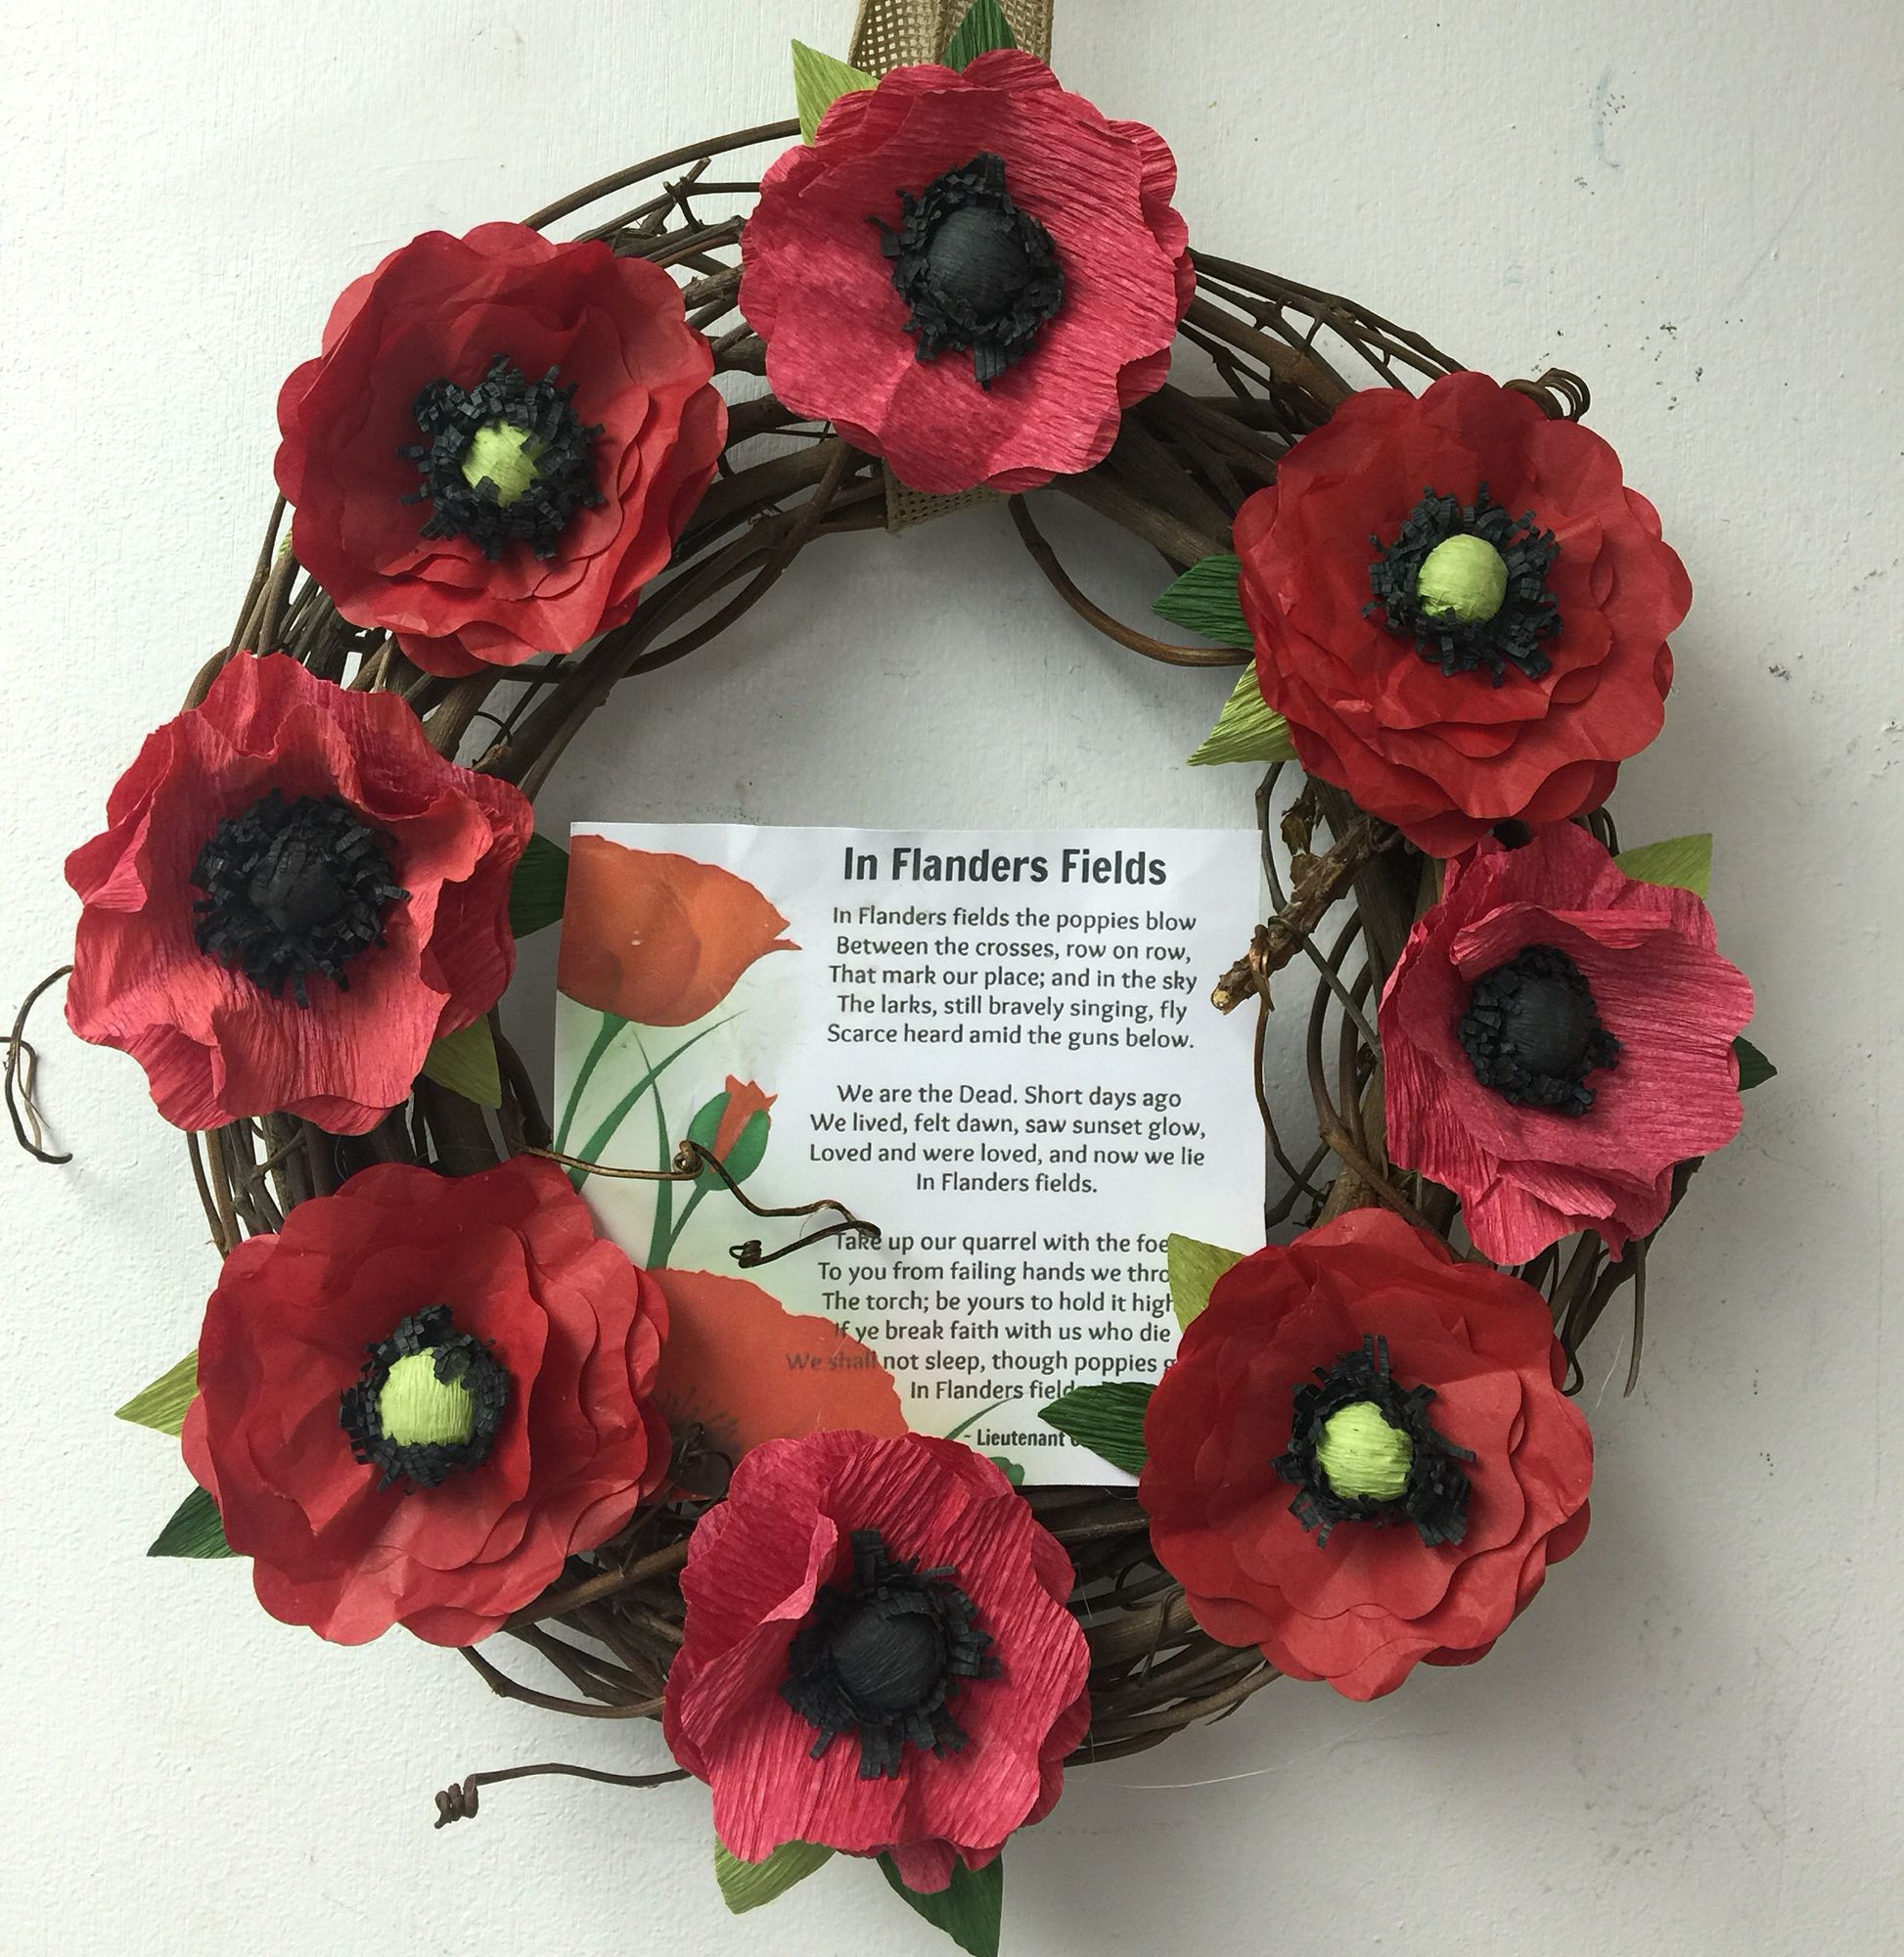 Poppy wreath veterans day wreath sizzix eileen hull die cut crepe poppy wreath veterans day wreath sizzix eileen hull die cut crepe paper mightylinksfo